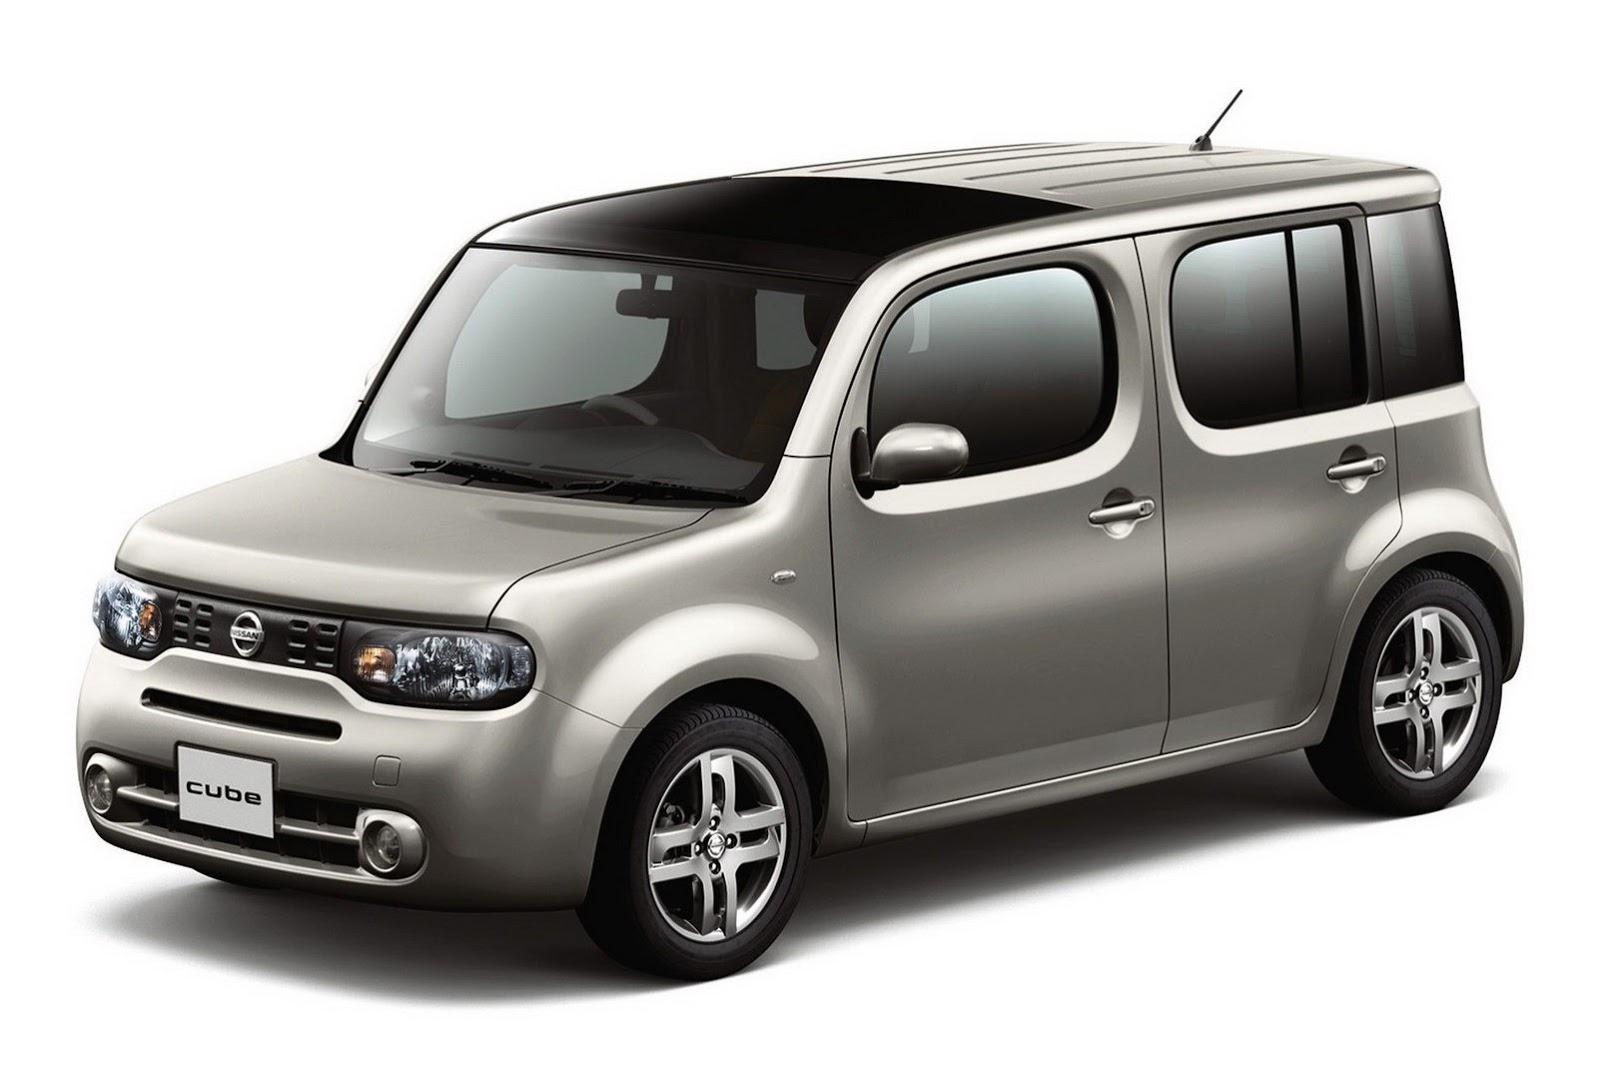 Nissan Cube โฉมปี 2013